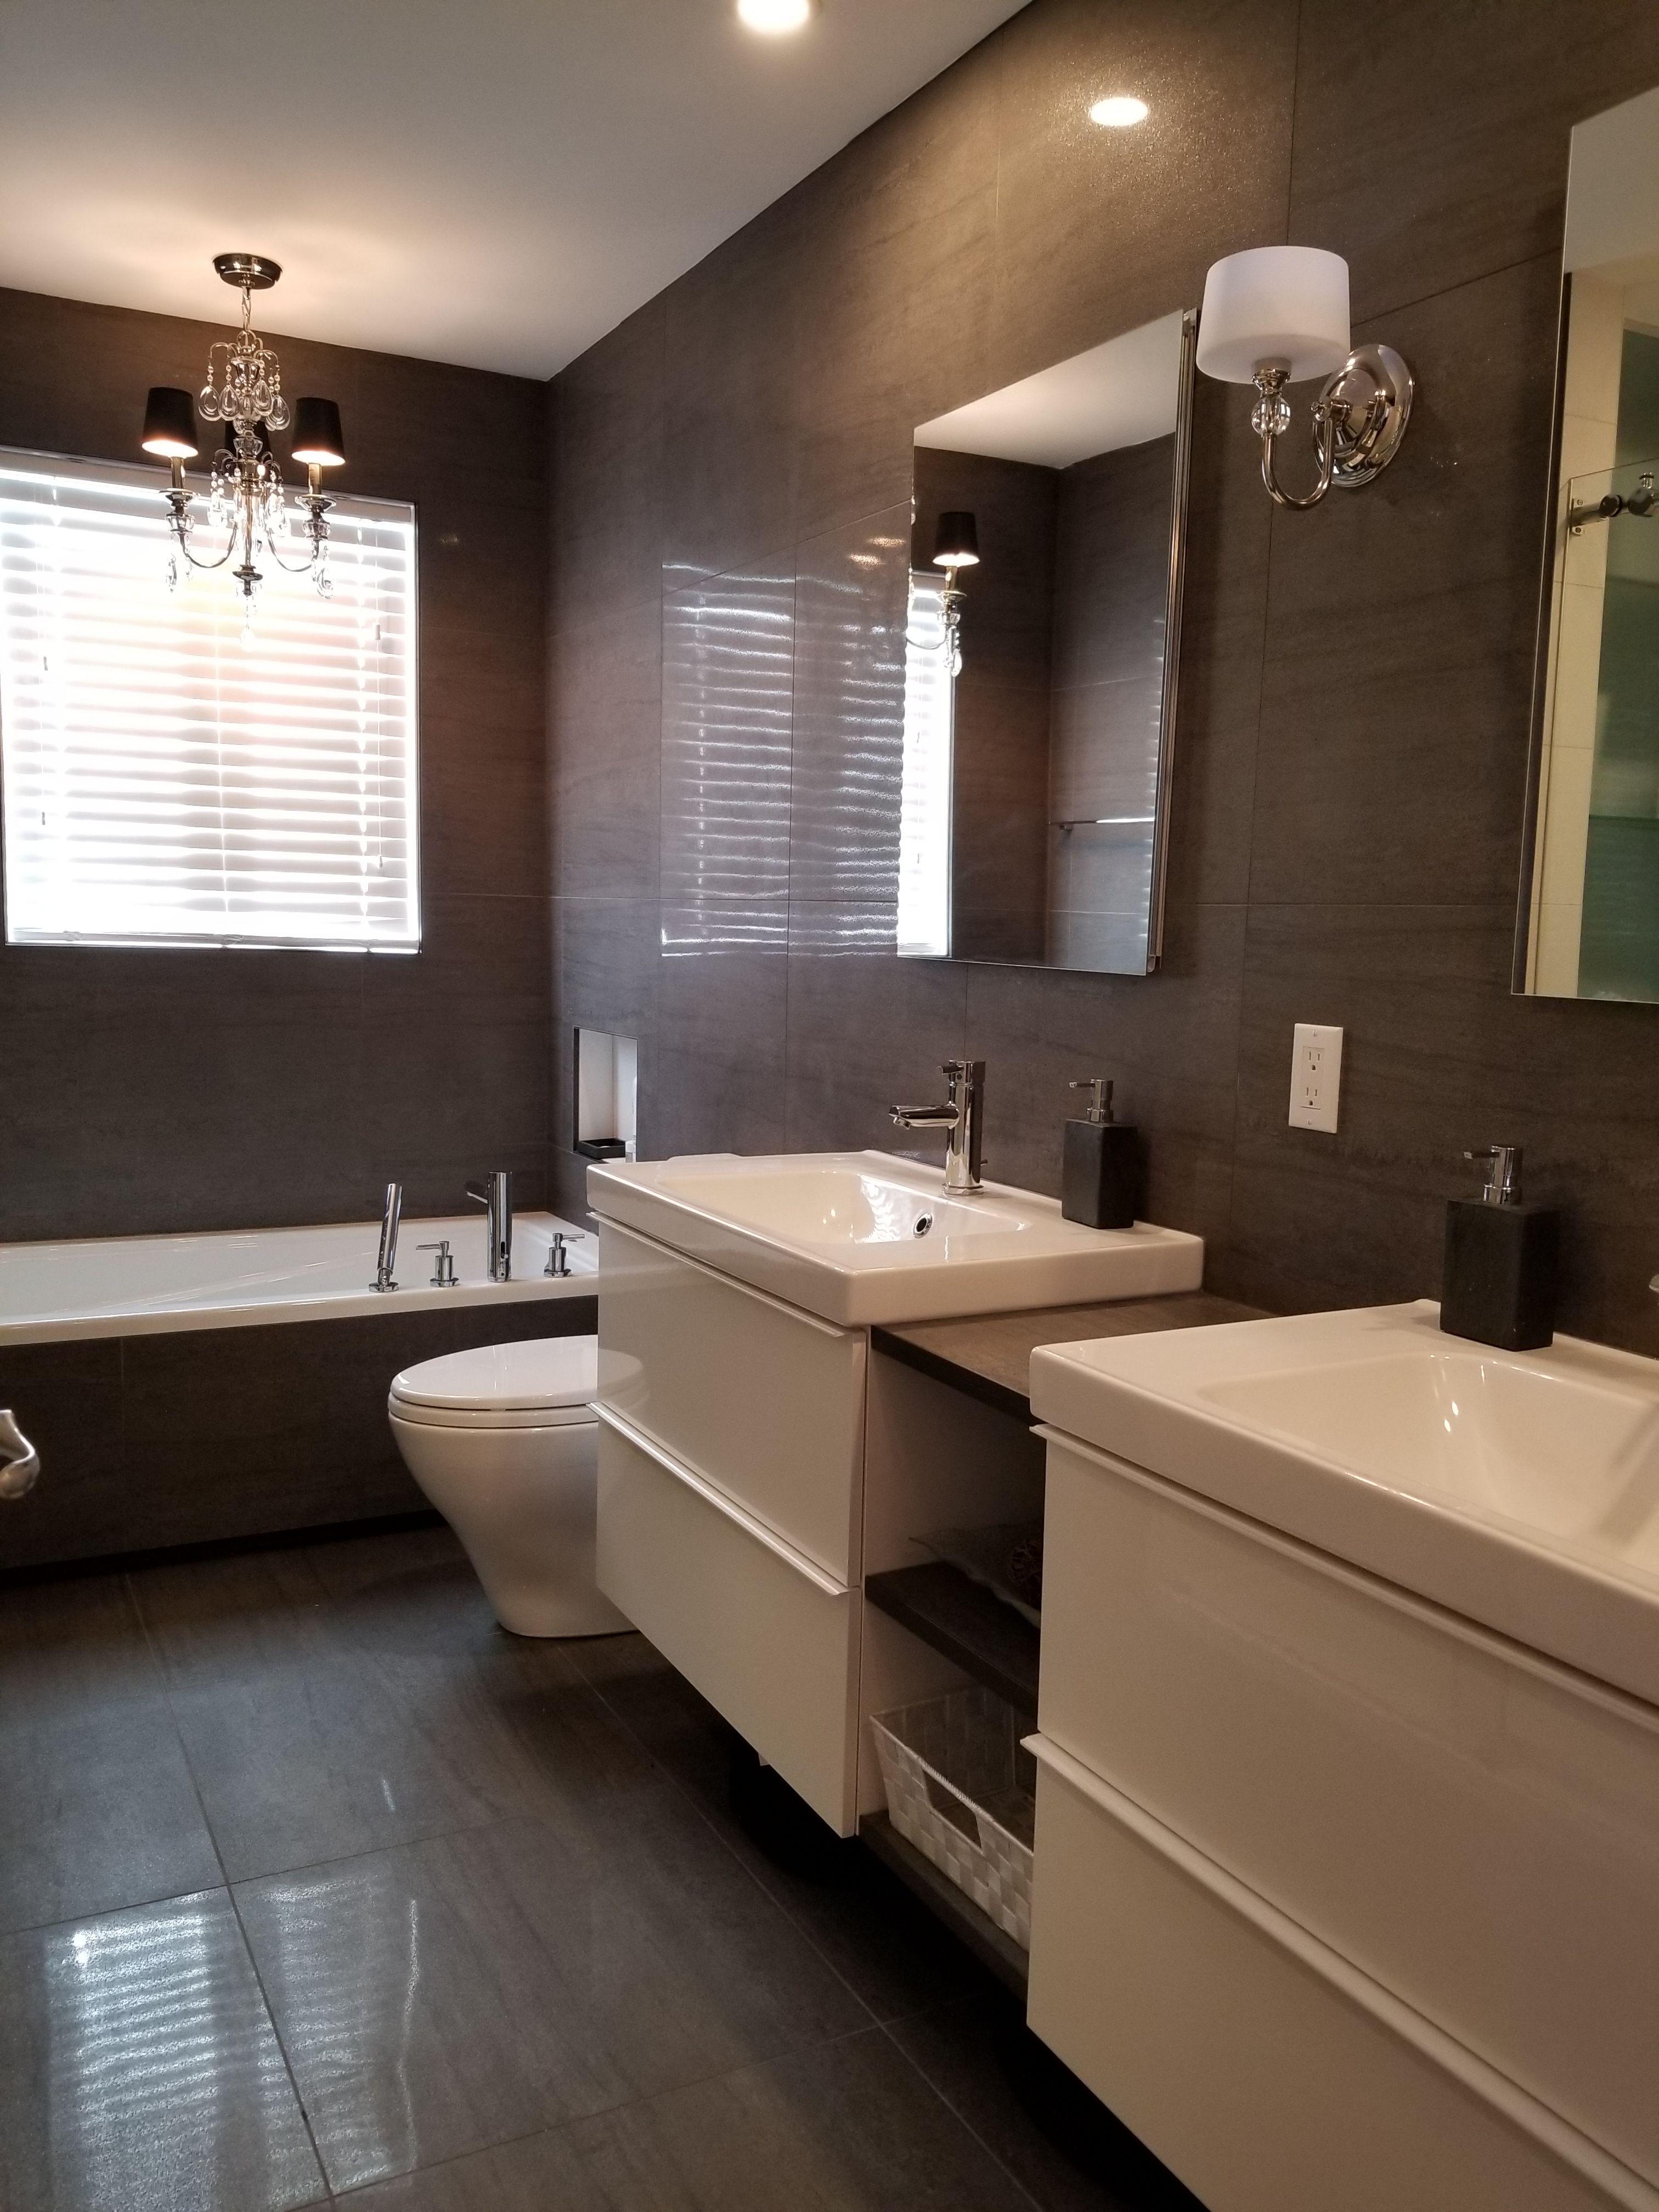 Salle de bain au style chic bling bling vanit s ikea Eclairage salle de bain ikea